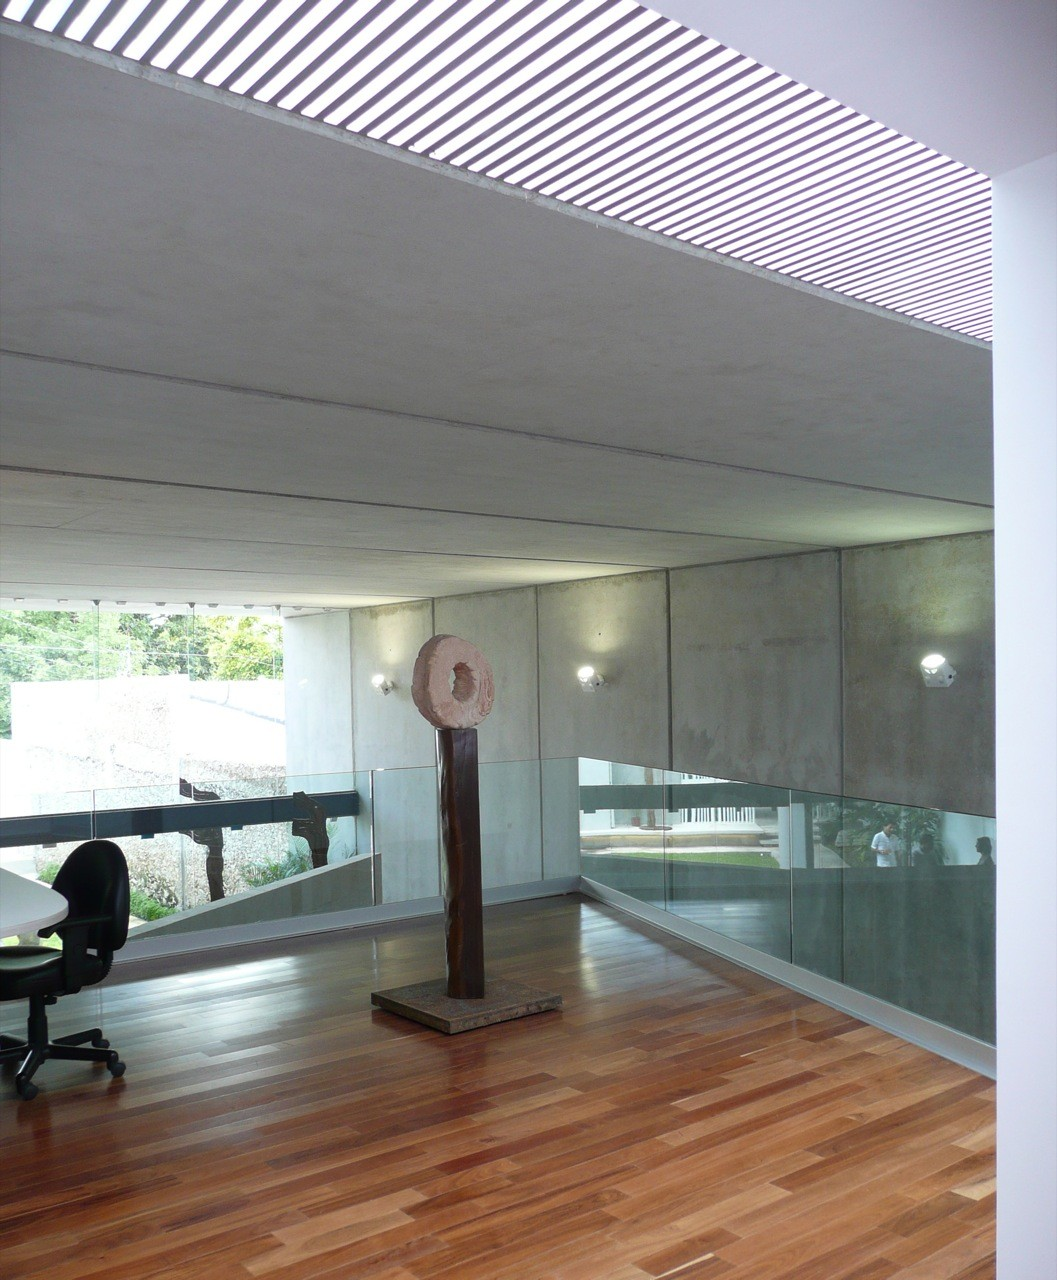 Galer a de estudio de arquitectos mu oz arquitectos 14 - Estudio de arquitectos ...